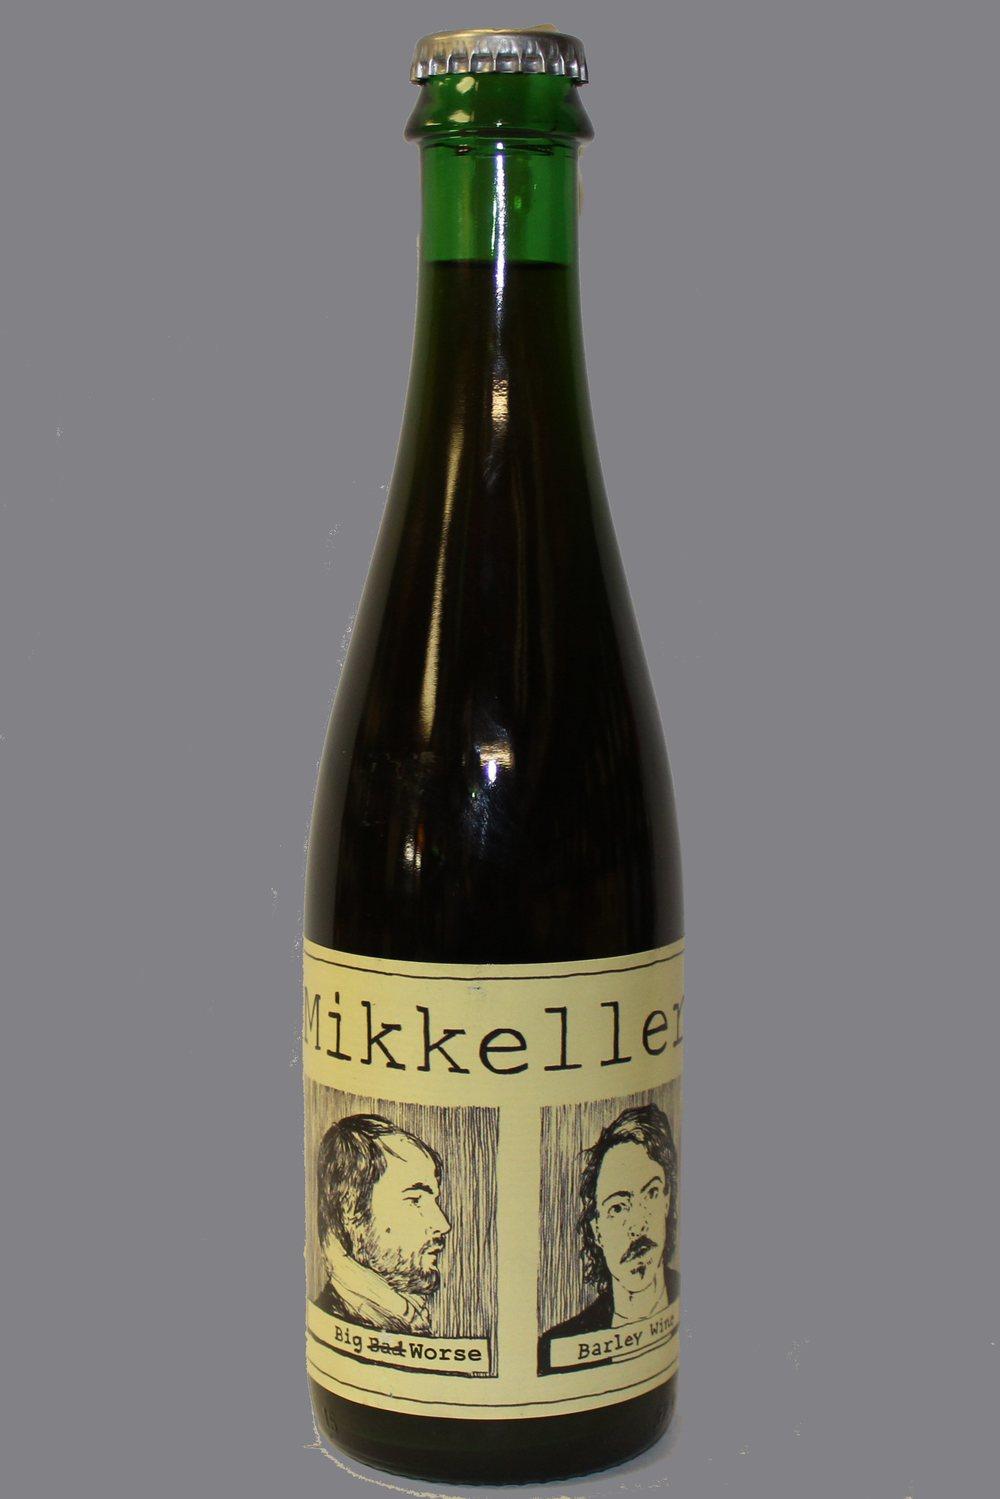 MIKKELLER-Big Worse Barley wine.jpg